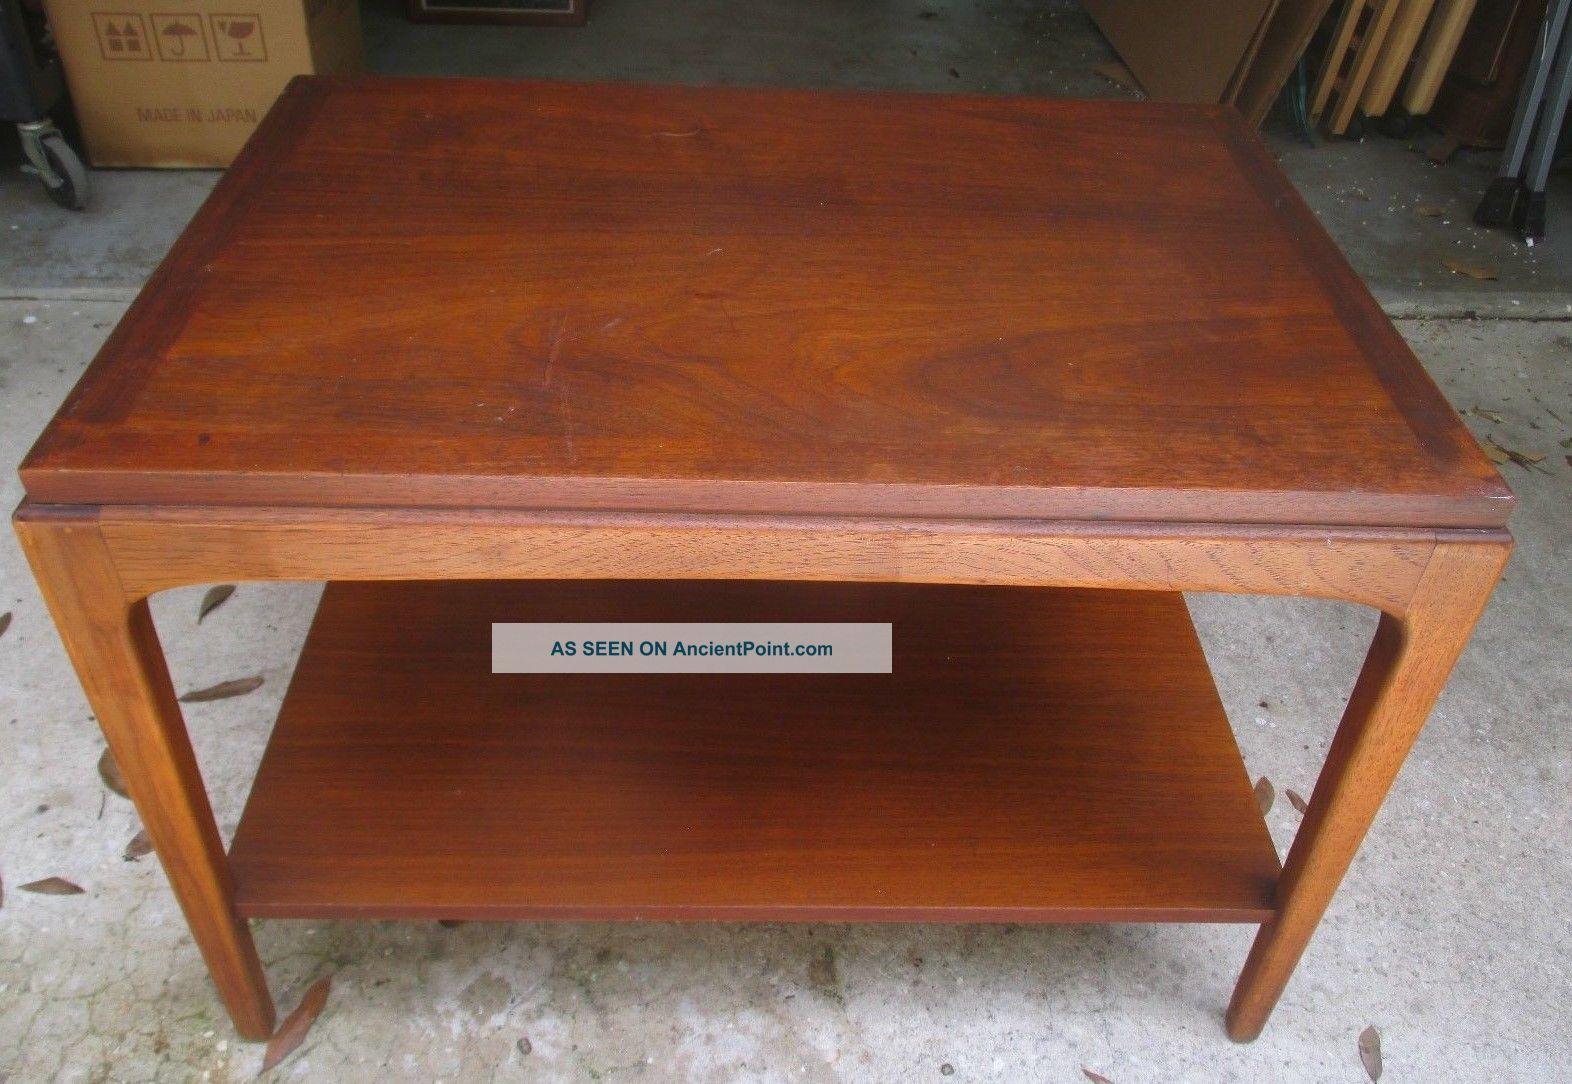 1962 Lane Mid Century Modern End Table W/shelf Altavista Virginia Mcm Post-1950 photo